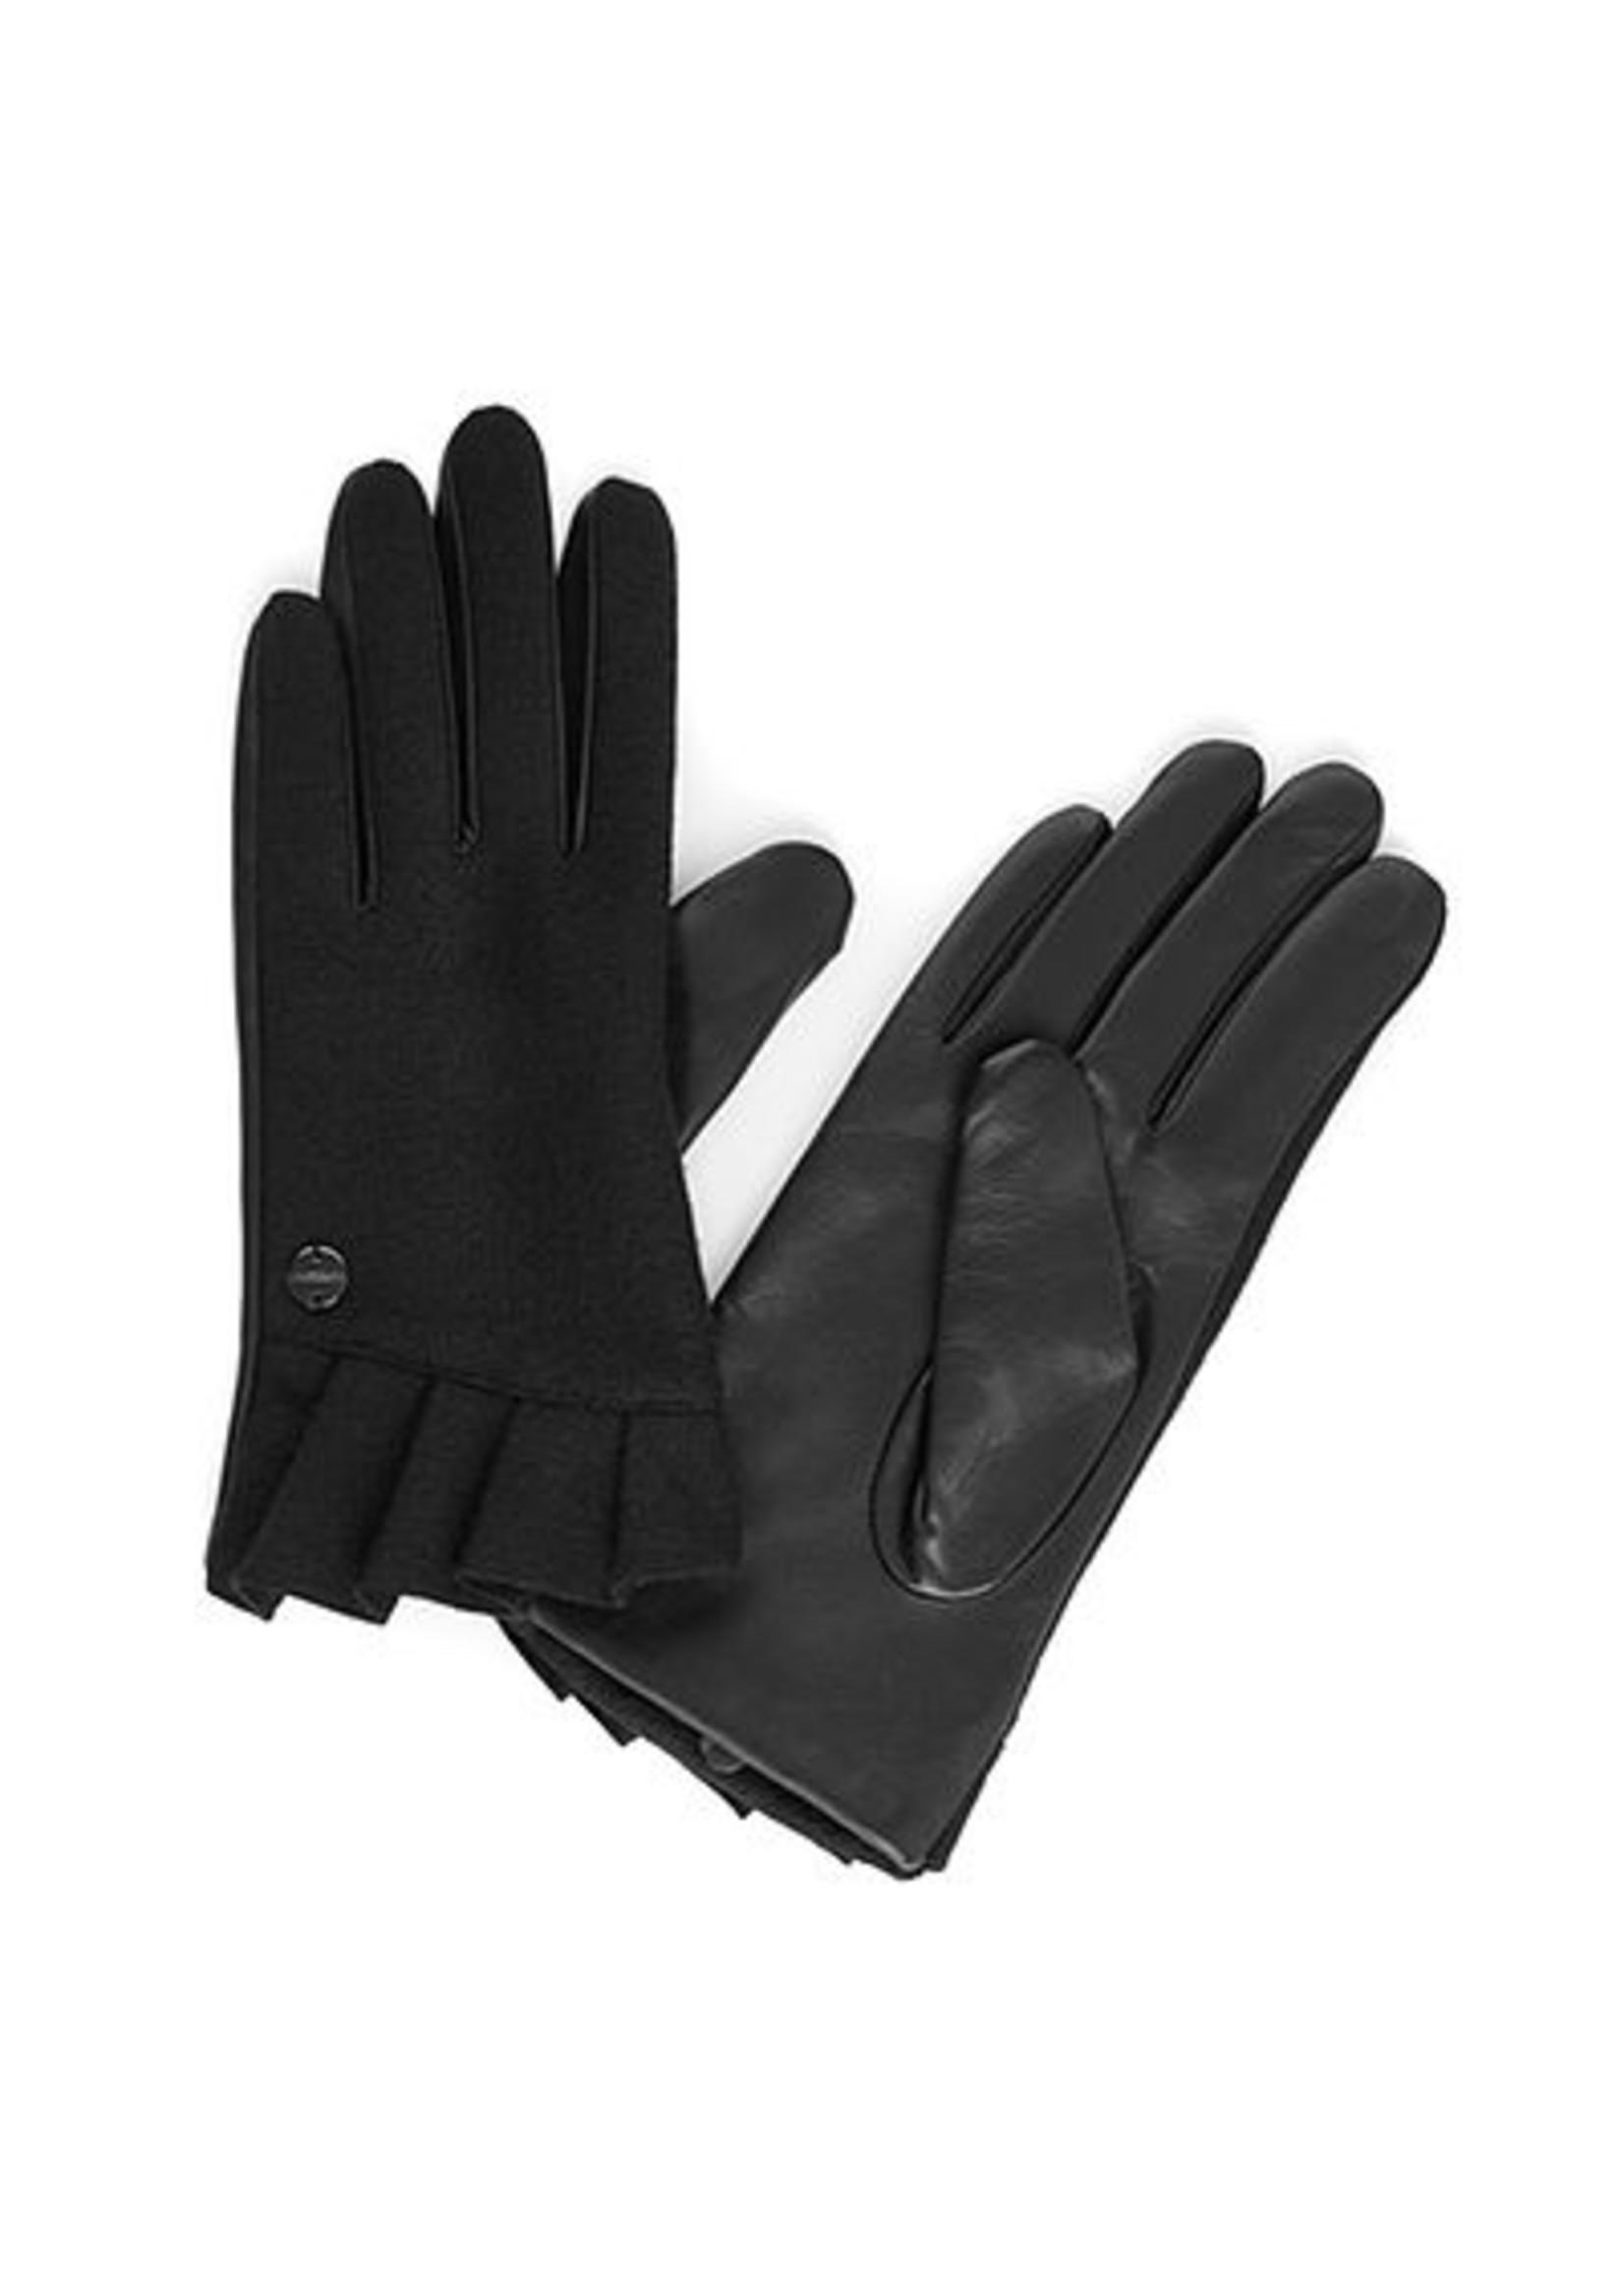 Handschoen RC F1.01 L82 black